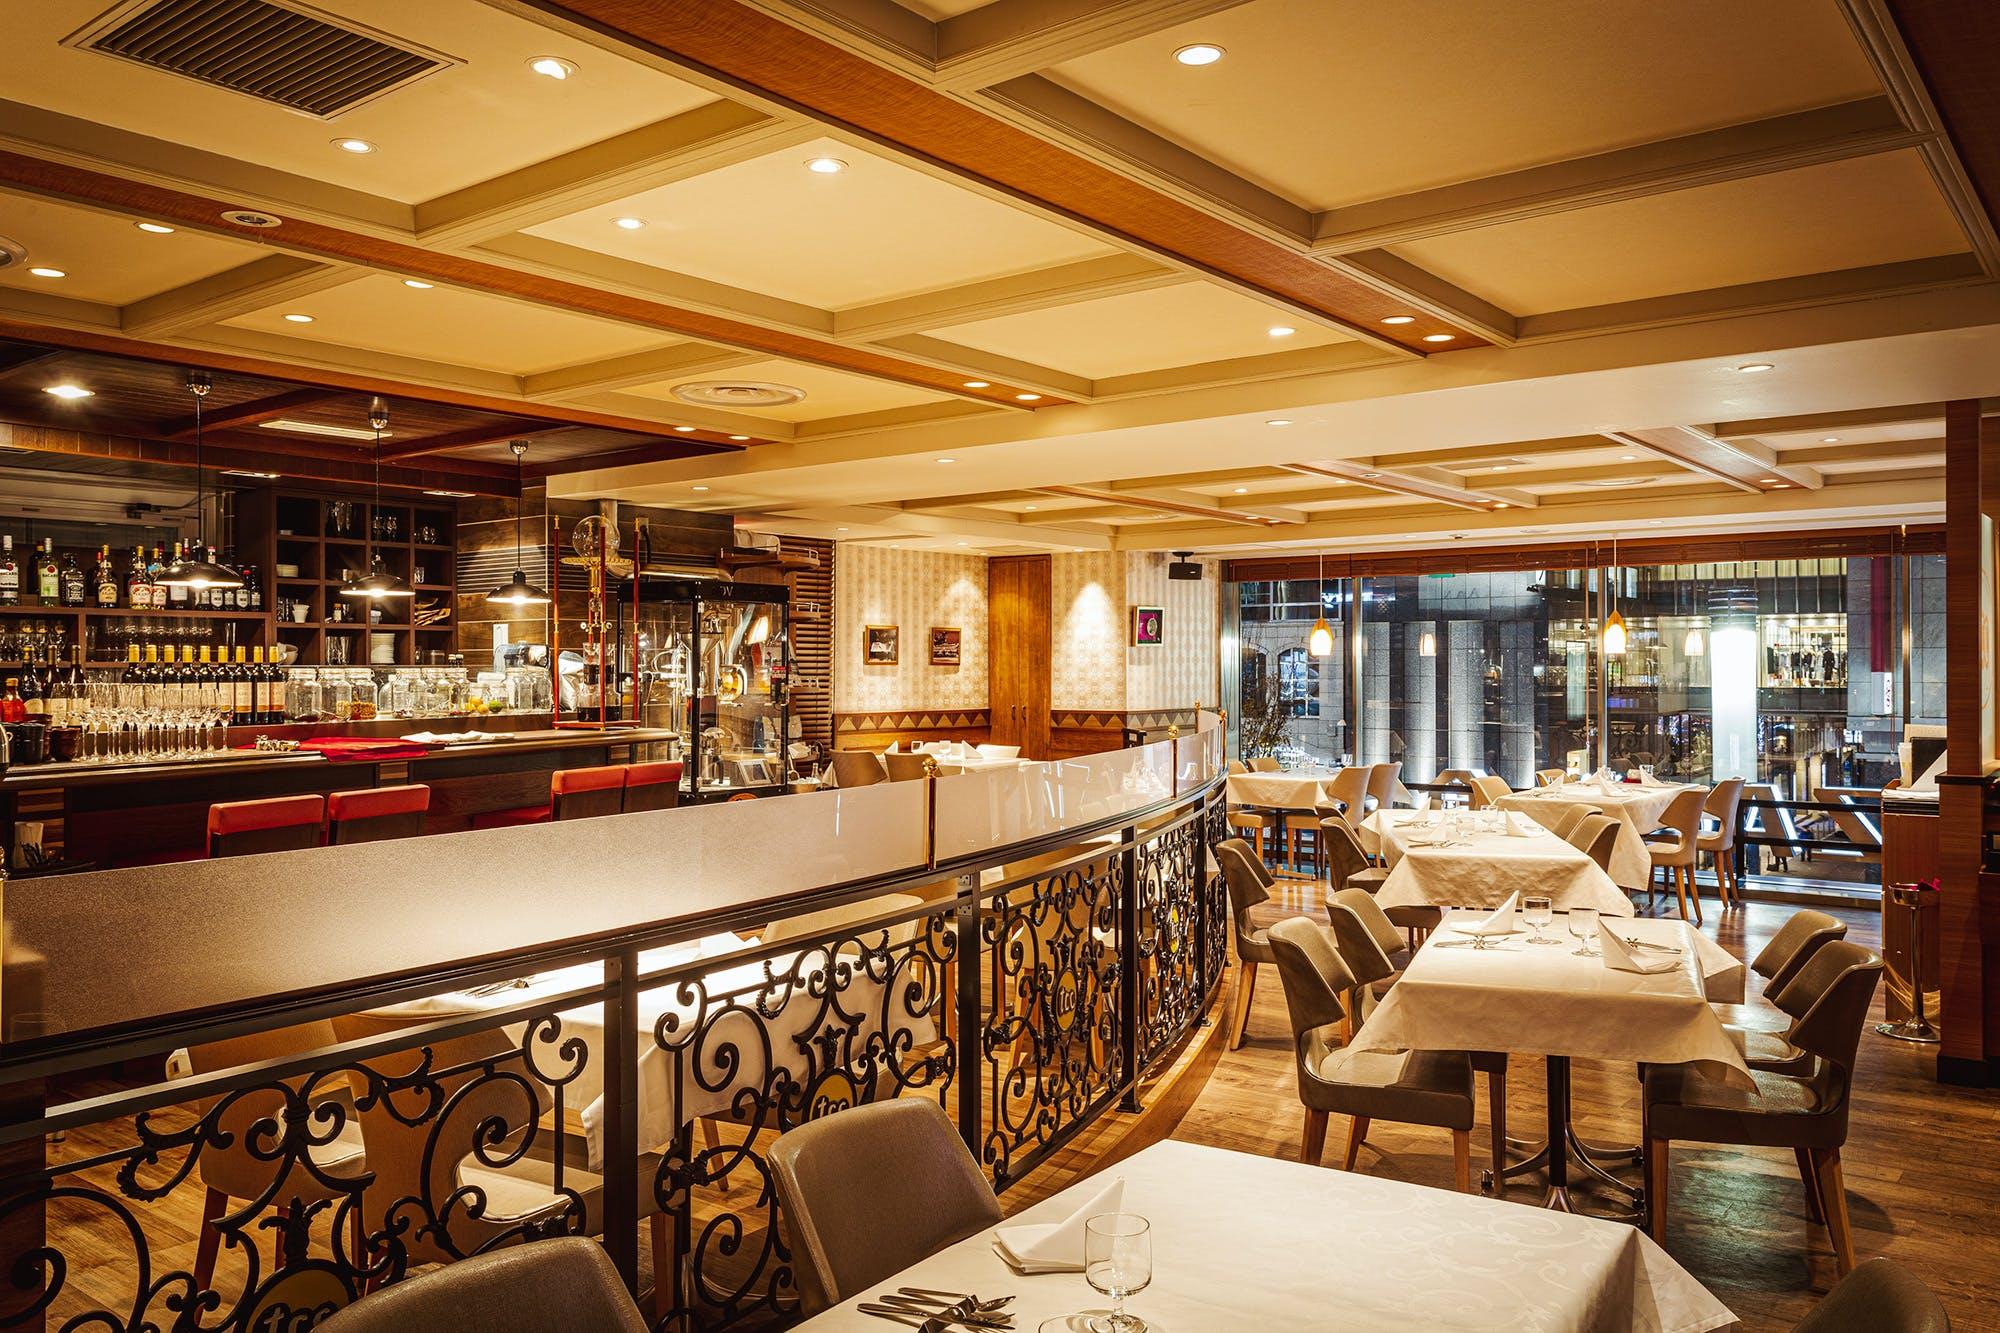 tcc Singaporean Cafe & Diner